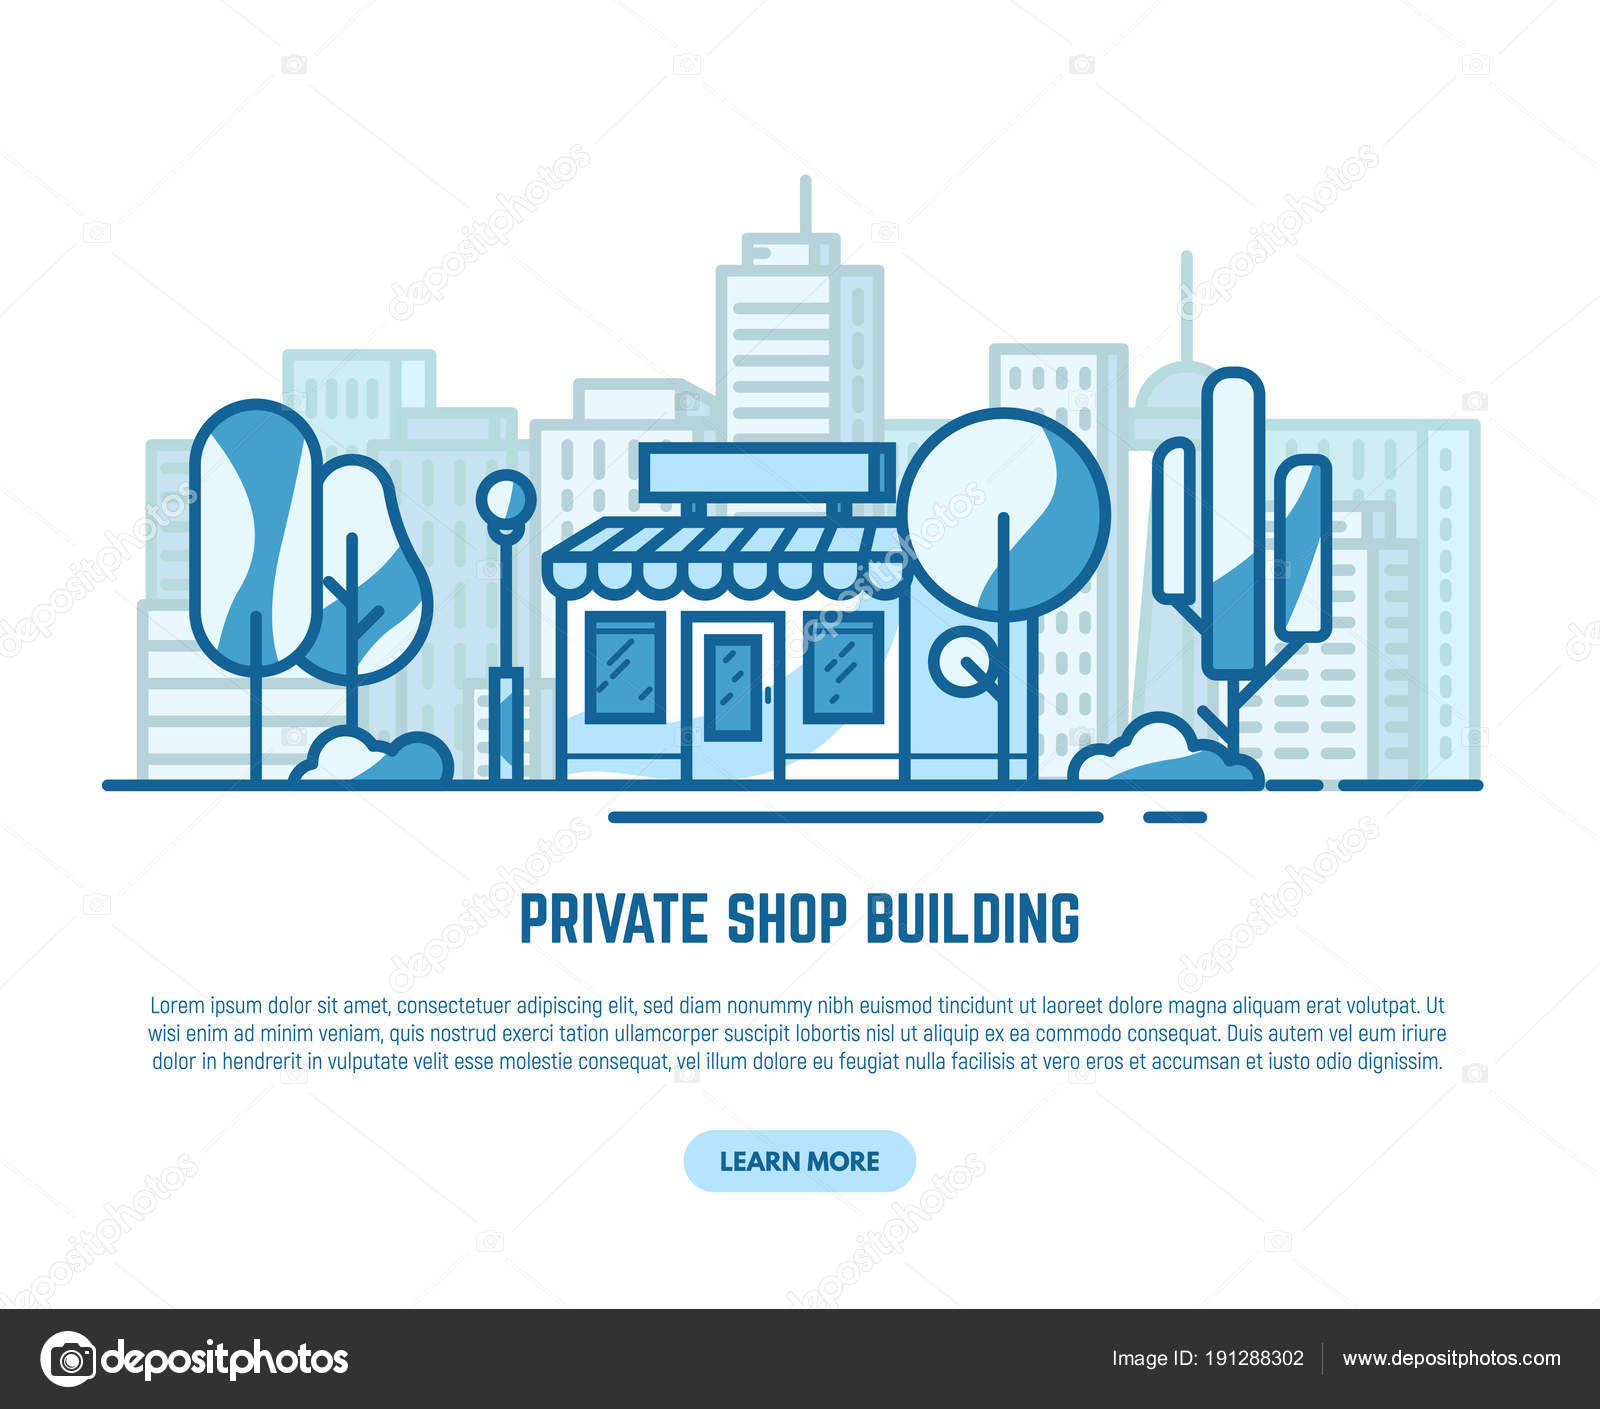 Private store building — Stock Vector © ikonstudios #191288302